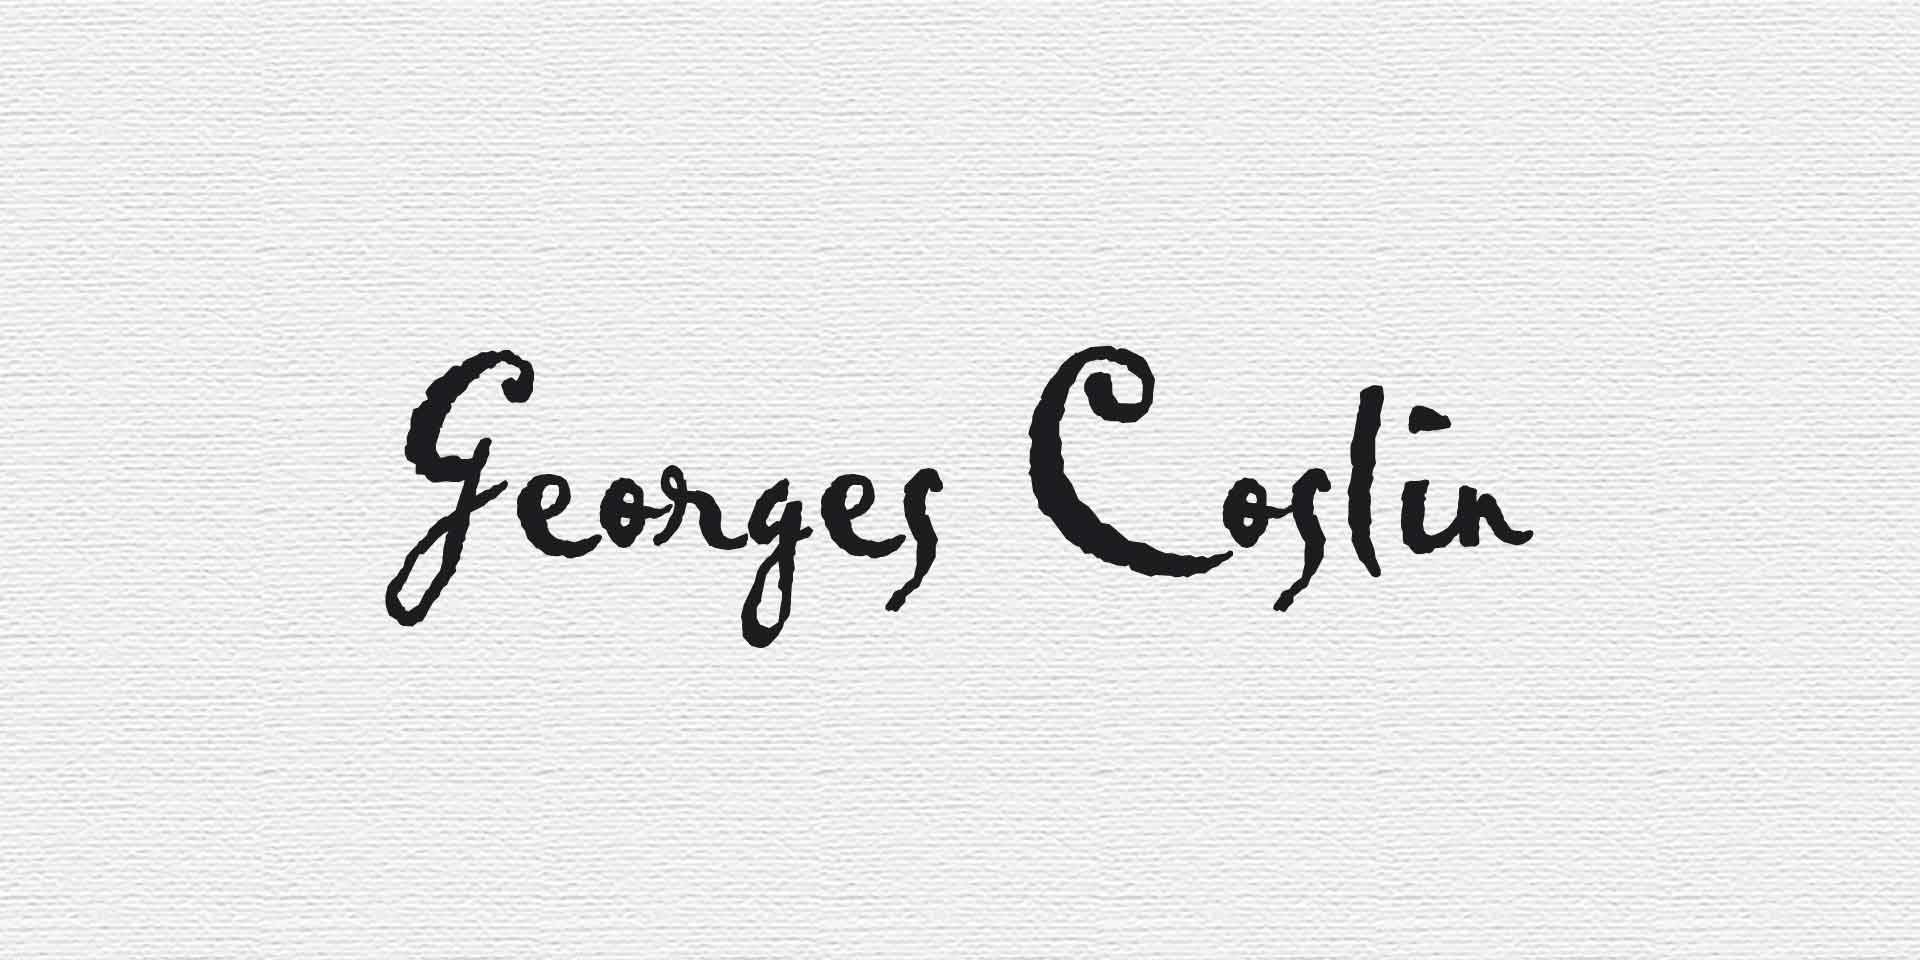 Georges Coslin